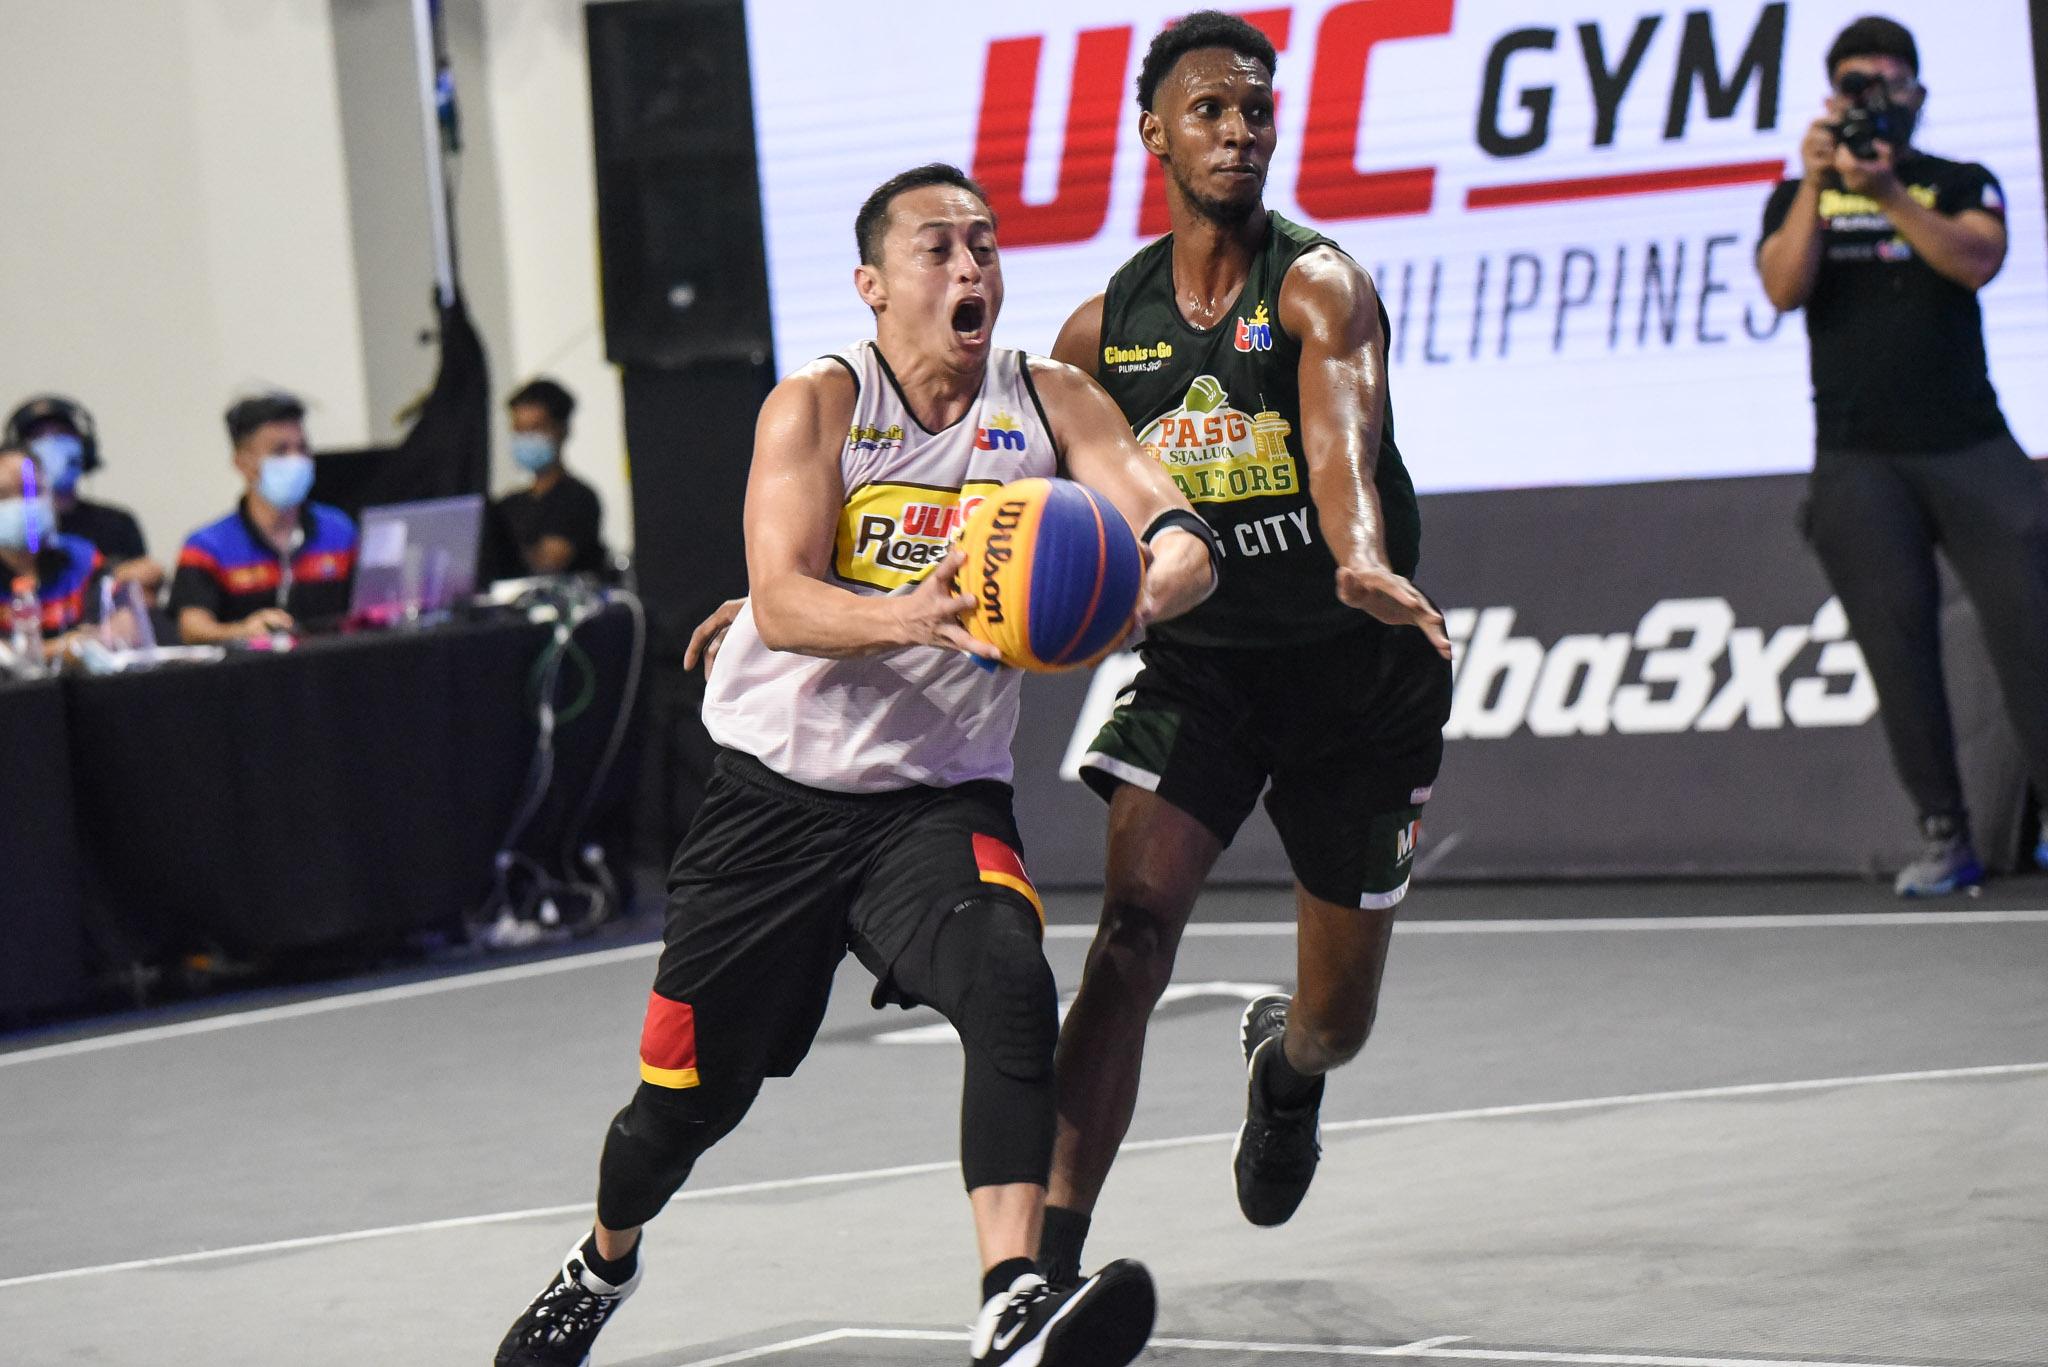 Chooks-to-Go-Pilipinas-3X3-Leg-3-Pasig-vs-Butuan-Lanete At 41, UR-Butuan's Chico Lanete still got it 3x3 Basketball Chooks-to-Go Pilipinas 3x3 News  - philippine sports news